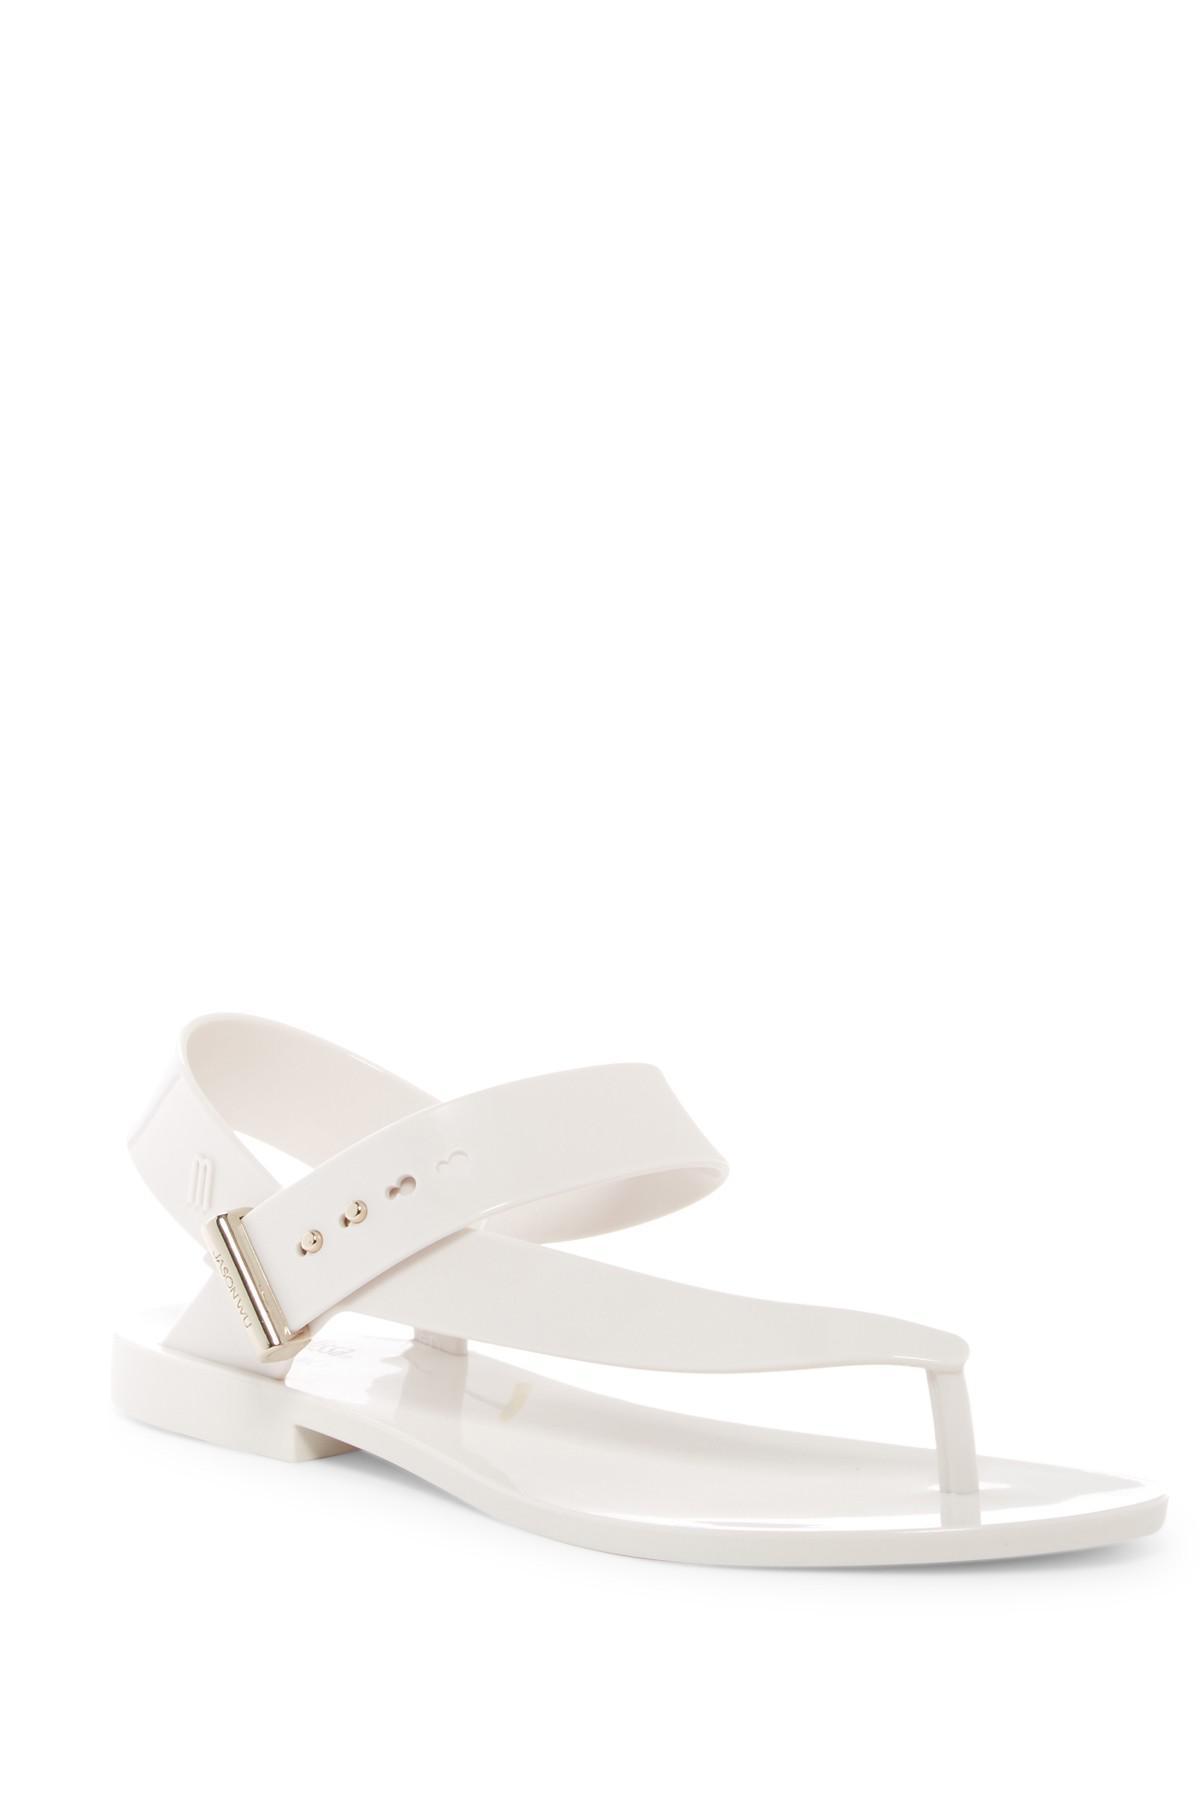 e1995358839f Lyst - Melissa X Jason Wu Asymmetrical Jelly Sandal in White